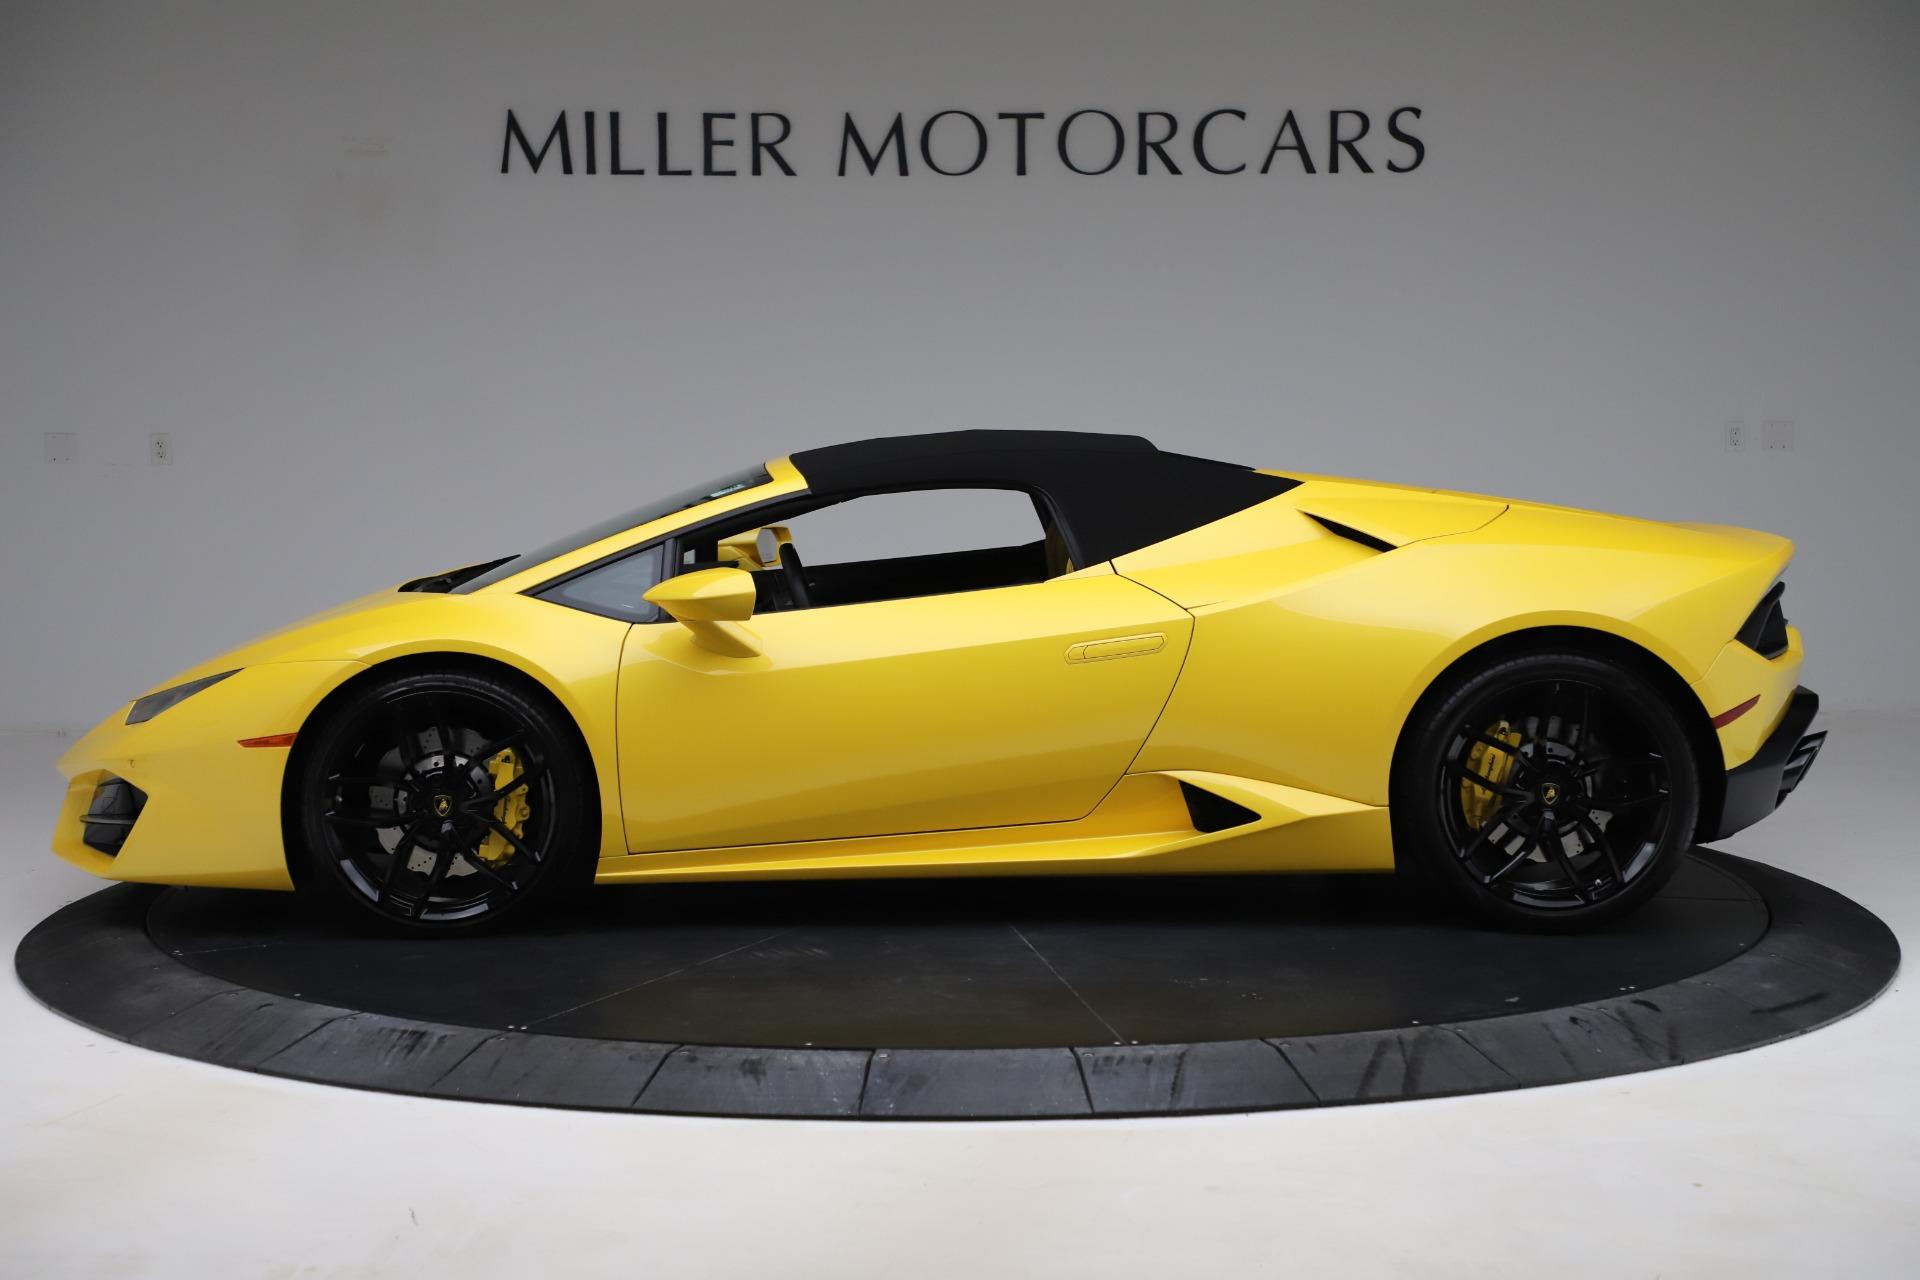 Used 2018 Lamborghini Huracan LP 580 2 Spyder